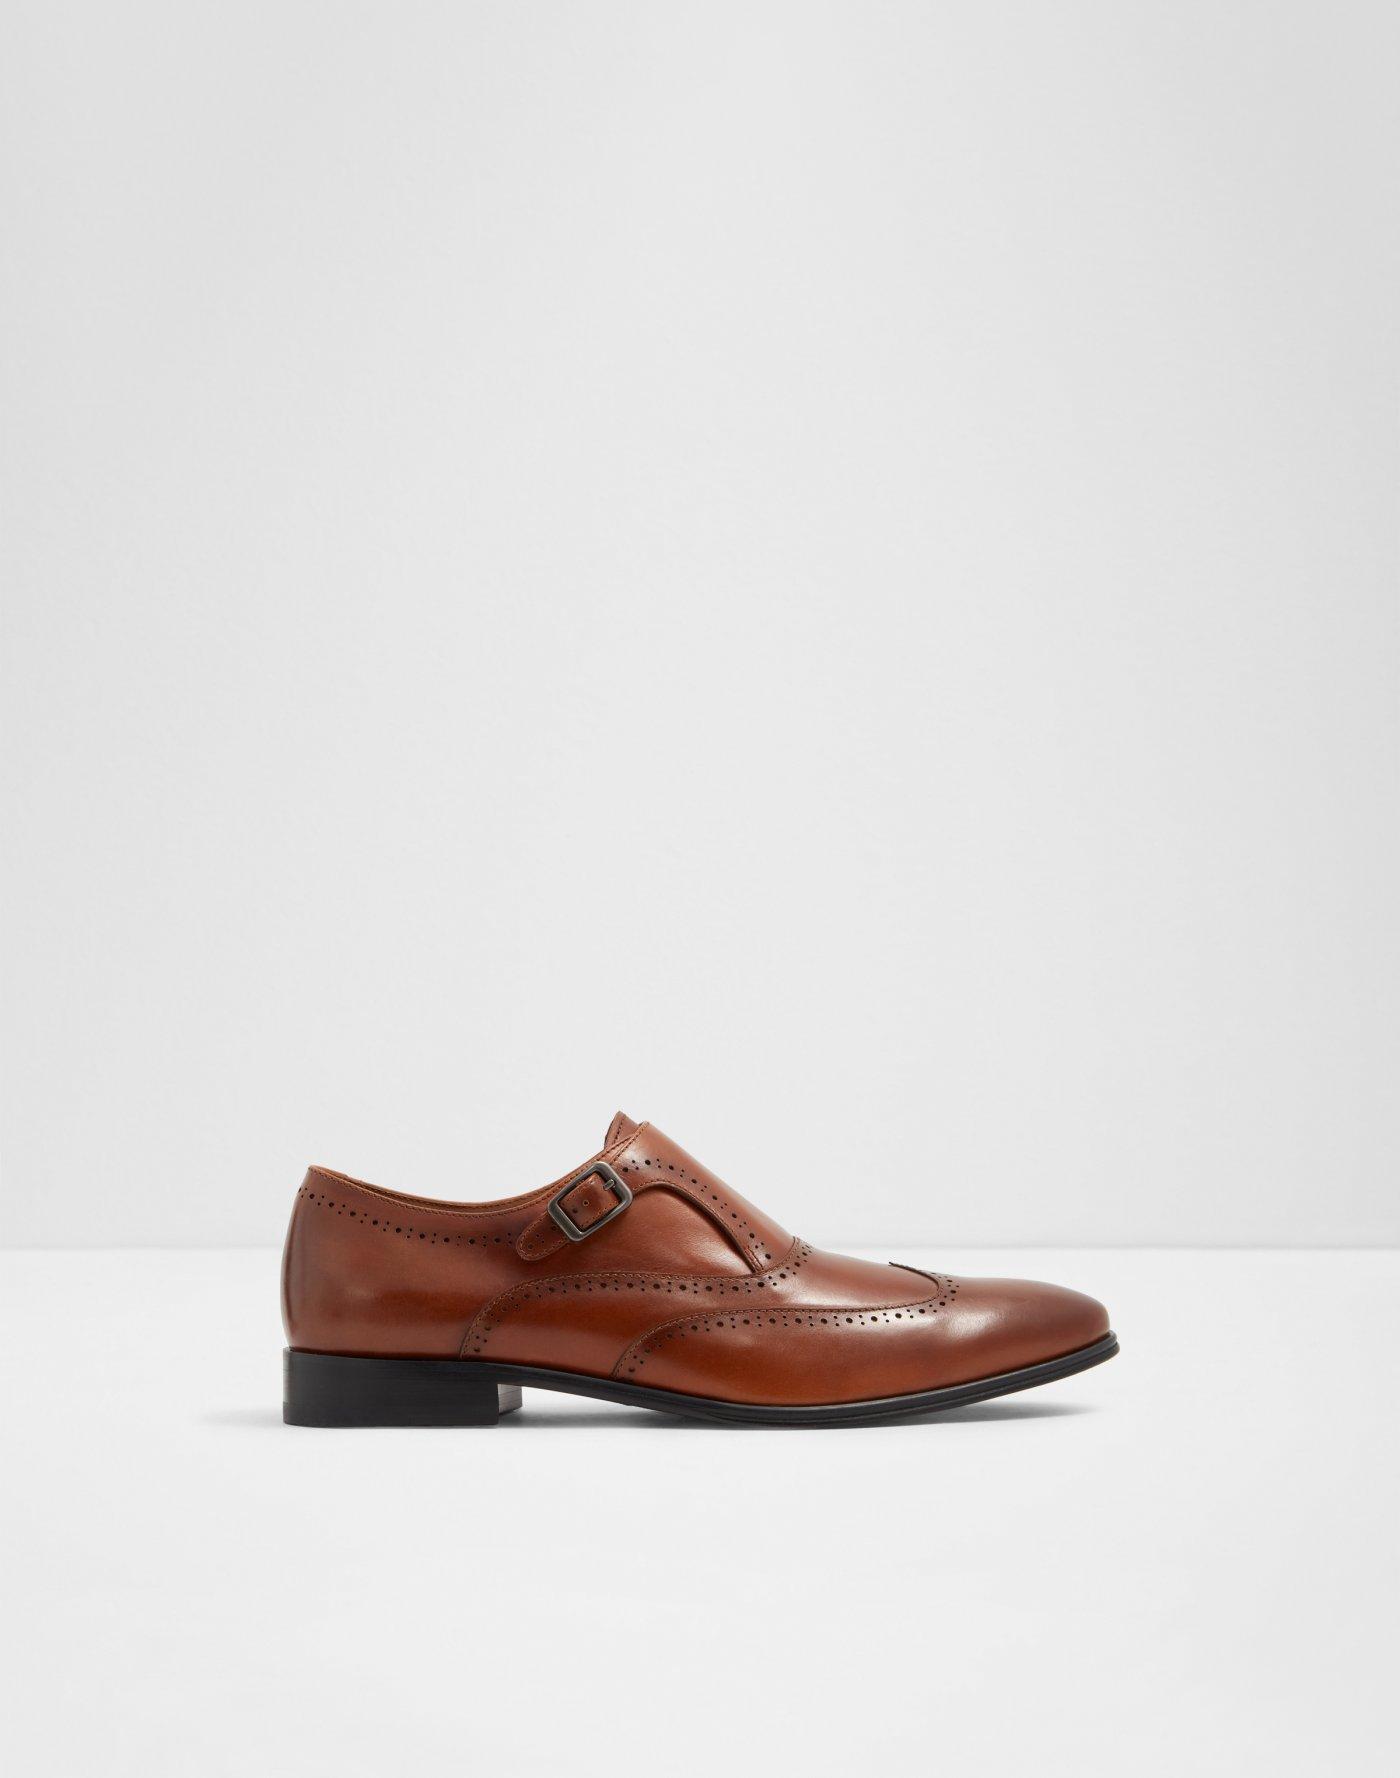 21d9a742ea All Men's Sales | Shoes, Accessories And Wallets | ALDO US ...